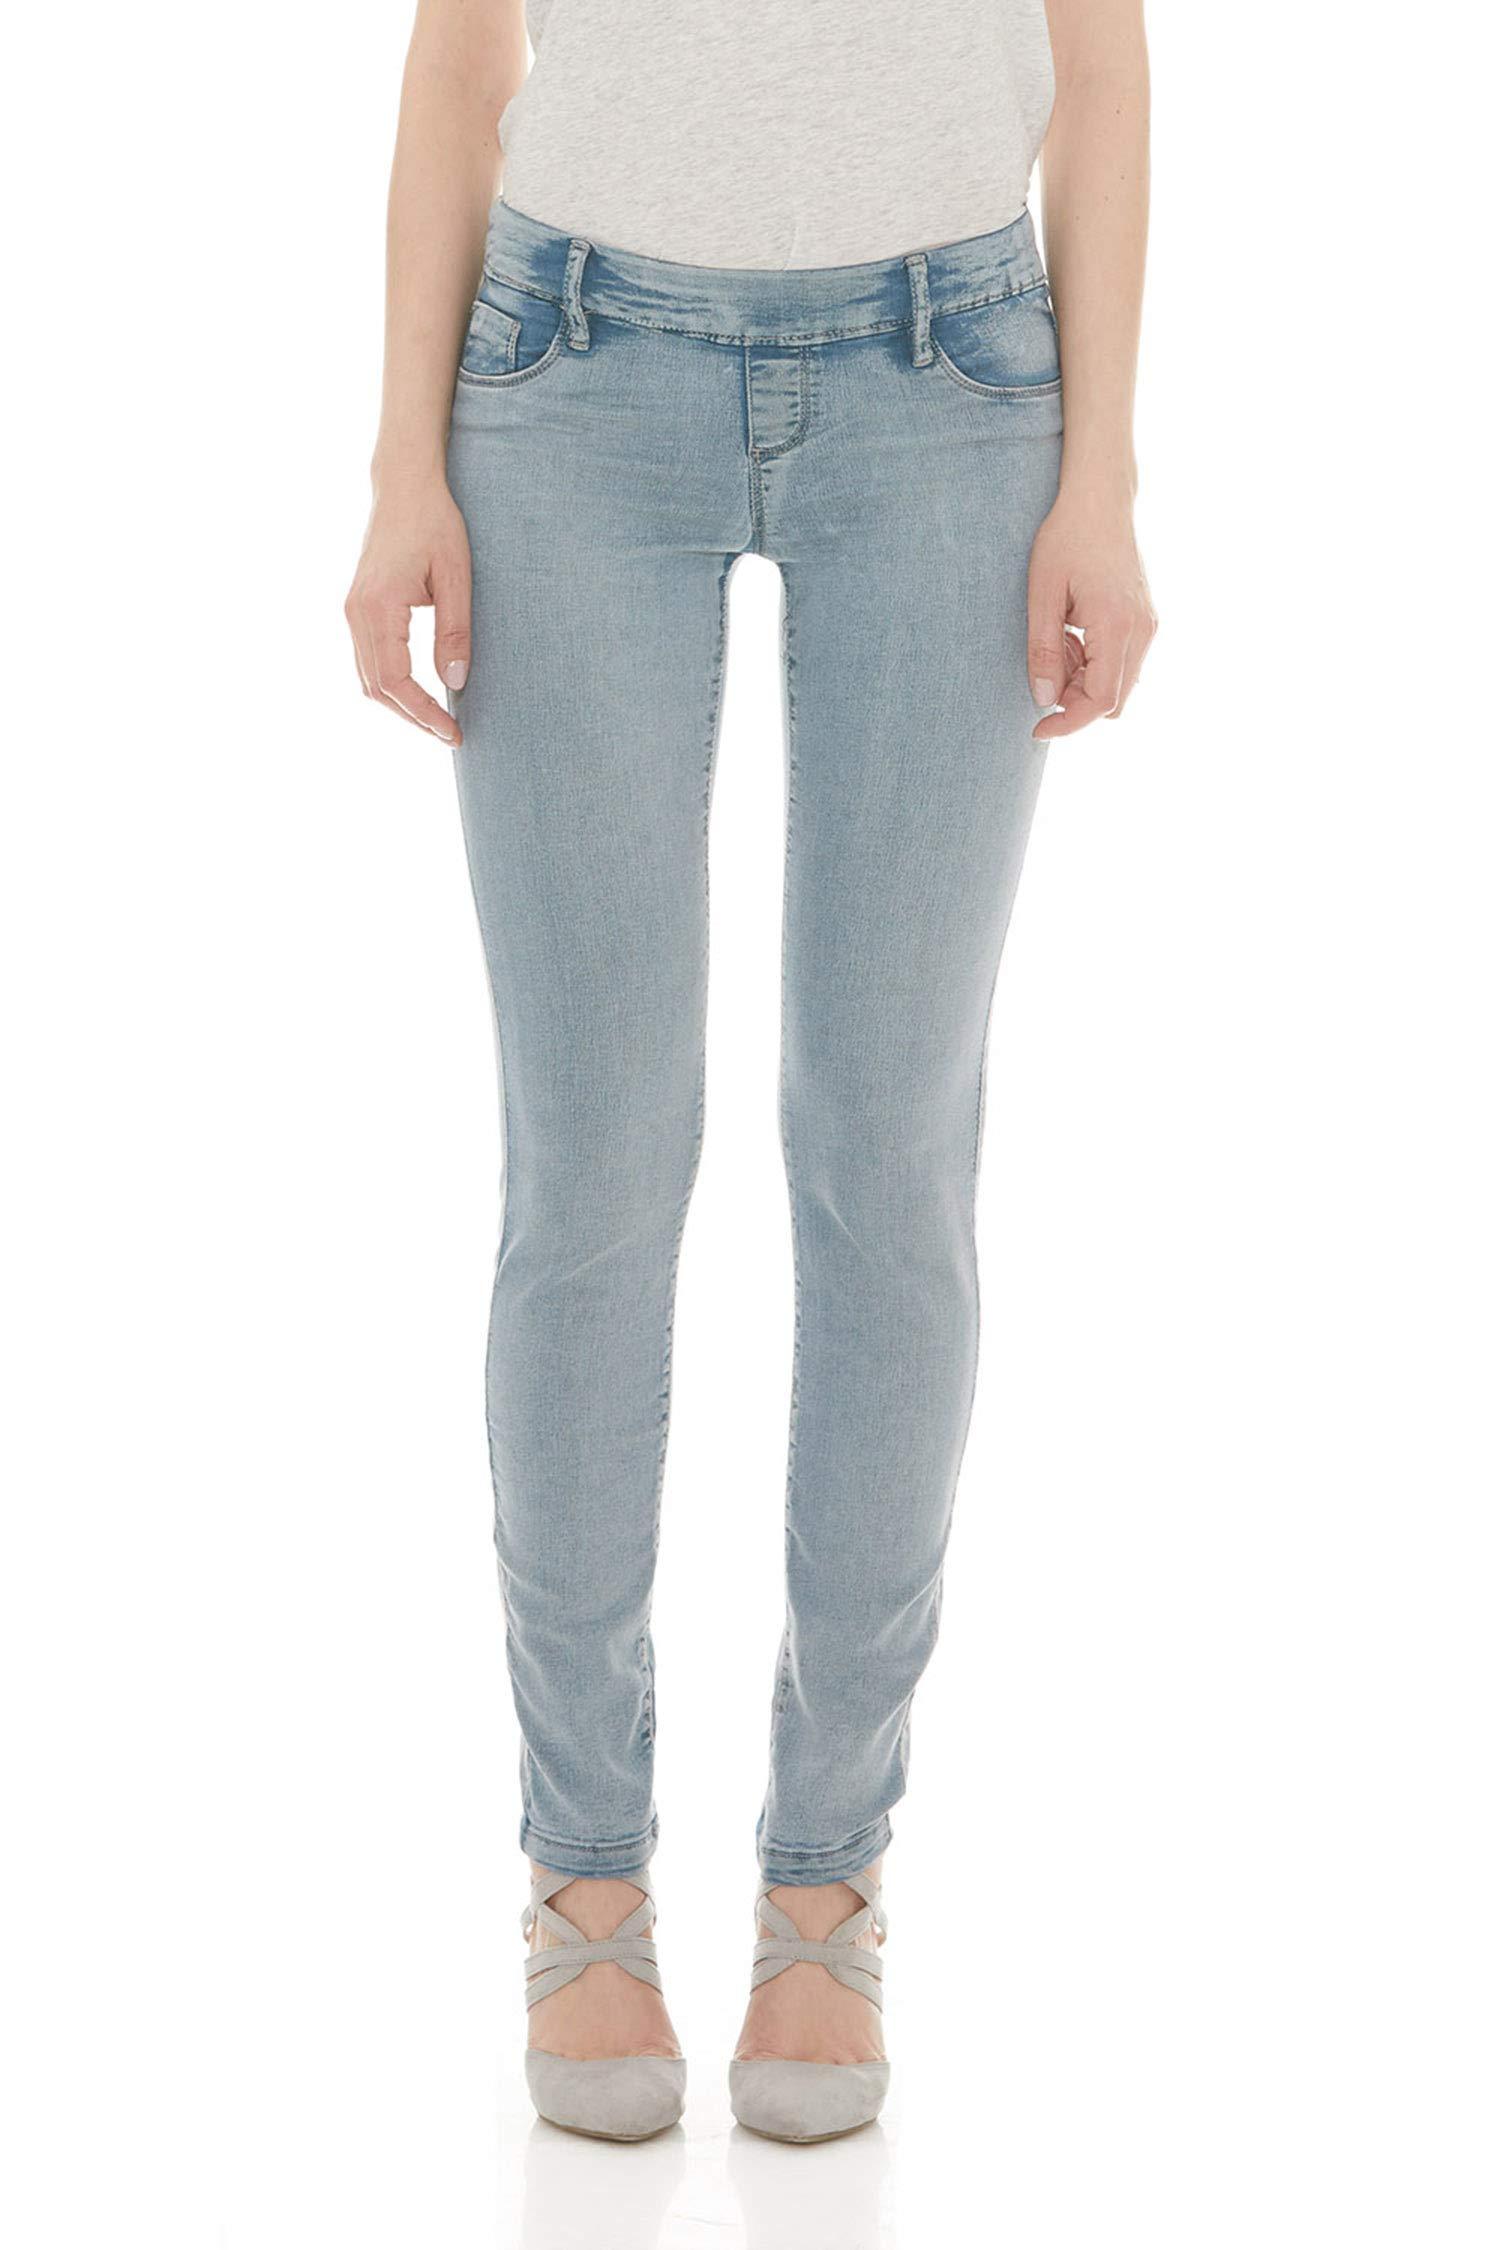 Suko Jeans Womens Denim Pants Mid Rise Boot Cut Stretch